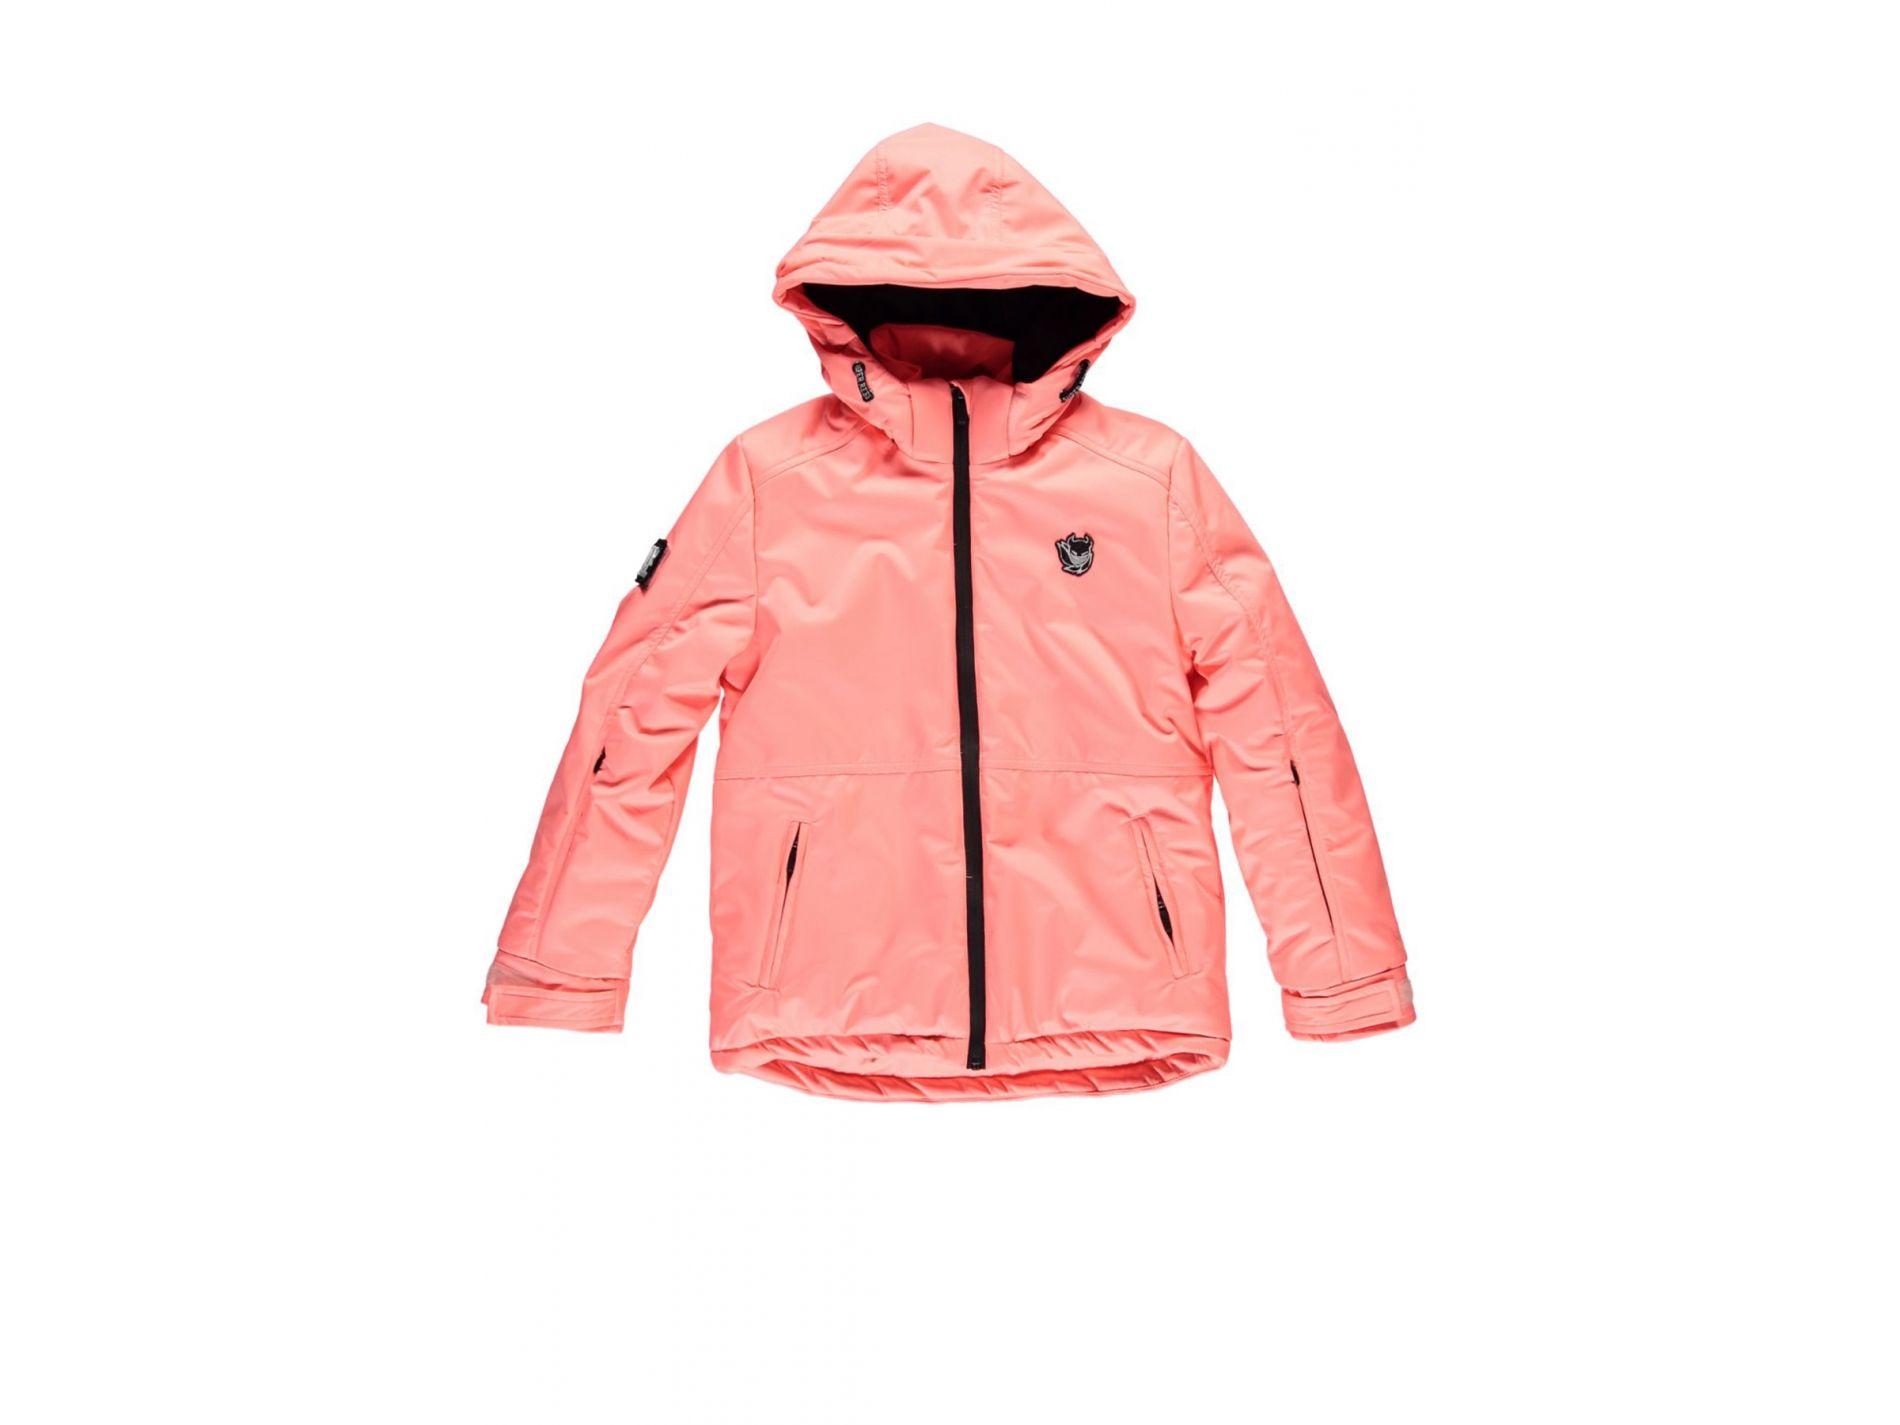 Superrebel G R809-6002U Ski jacket